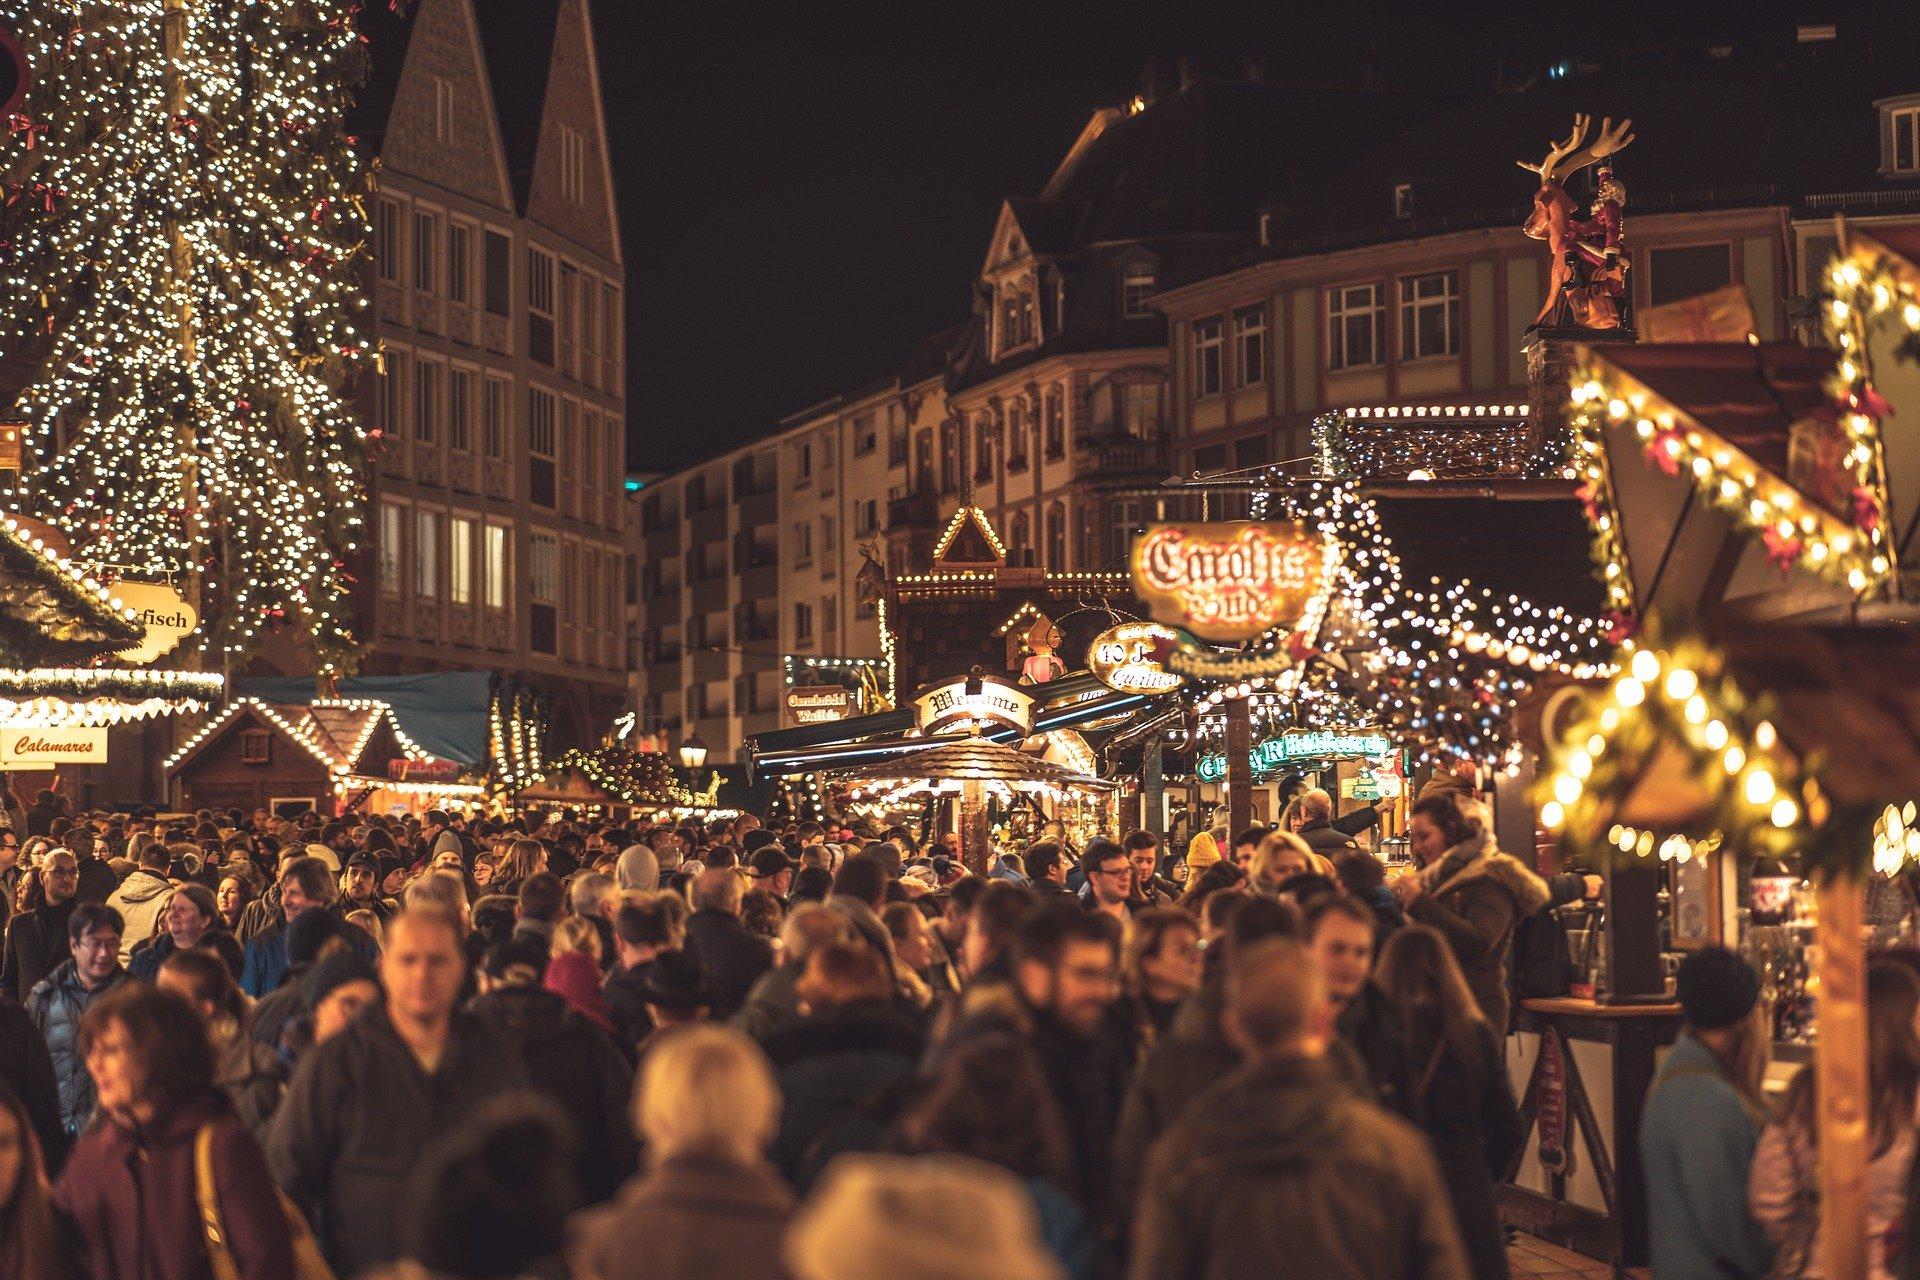 christmas-market-4705877_1920